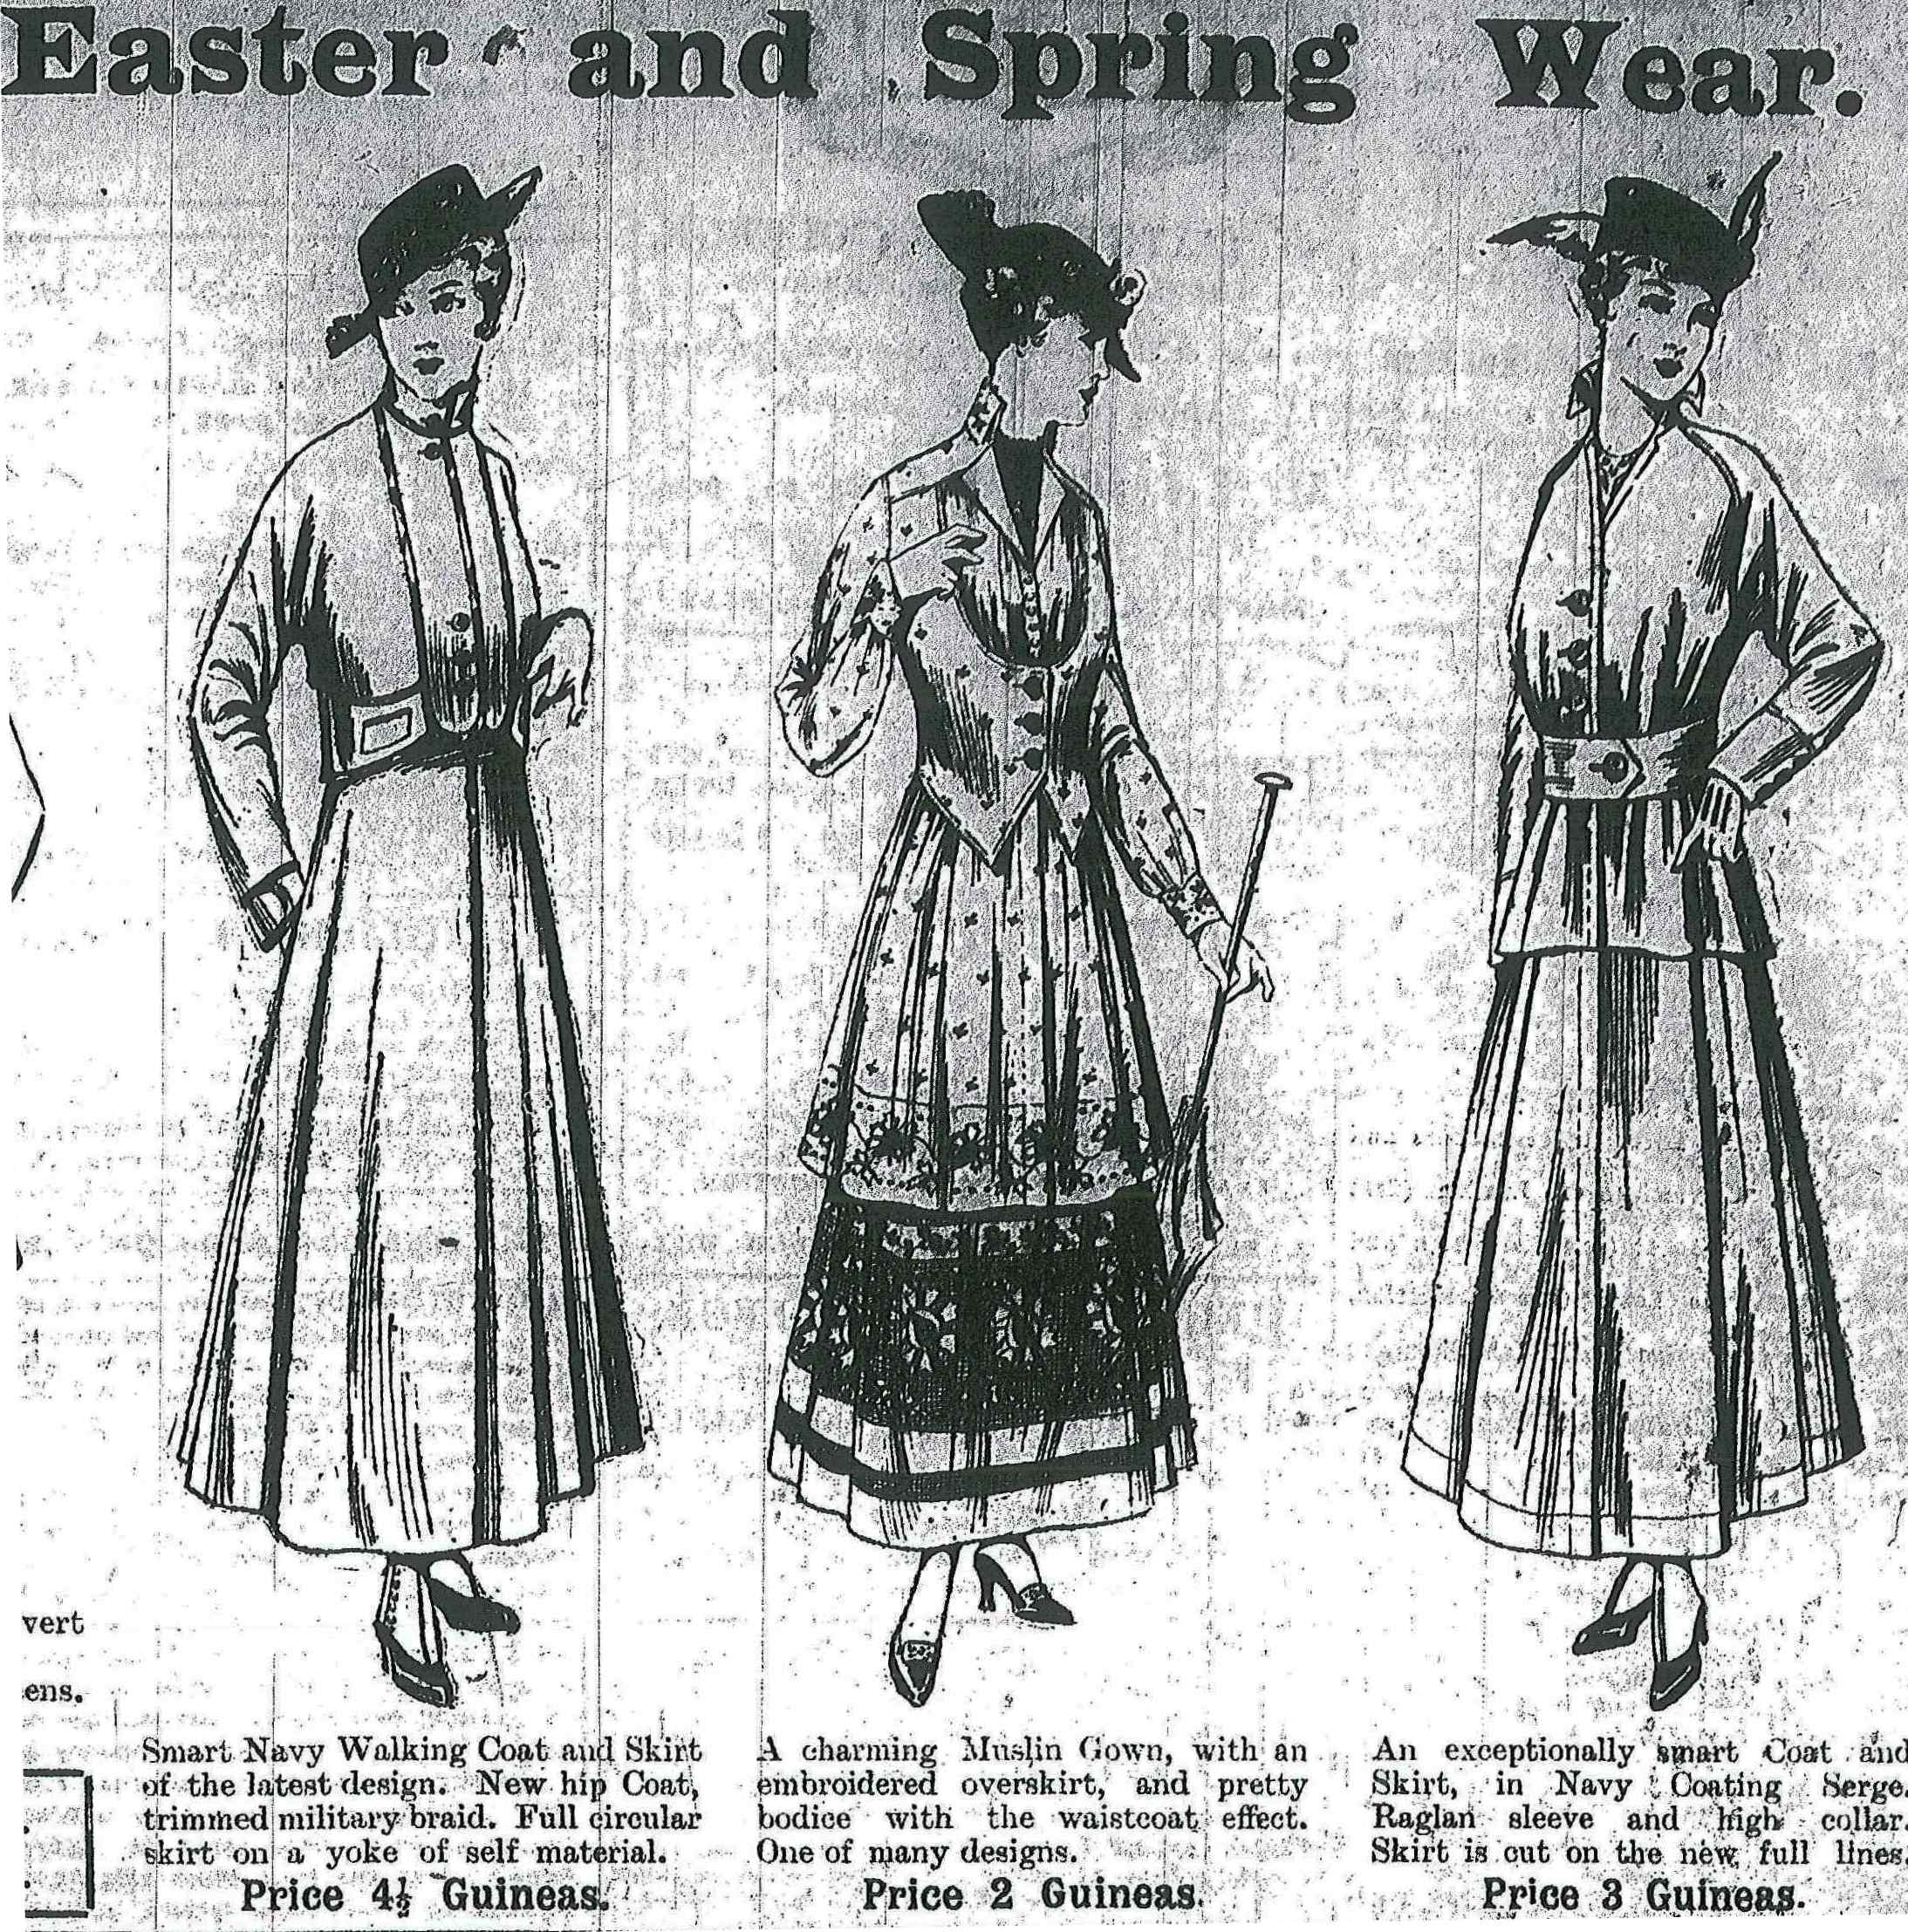 Easter & Springwear 1915